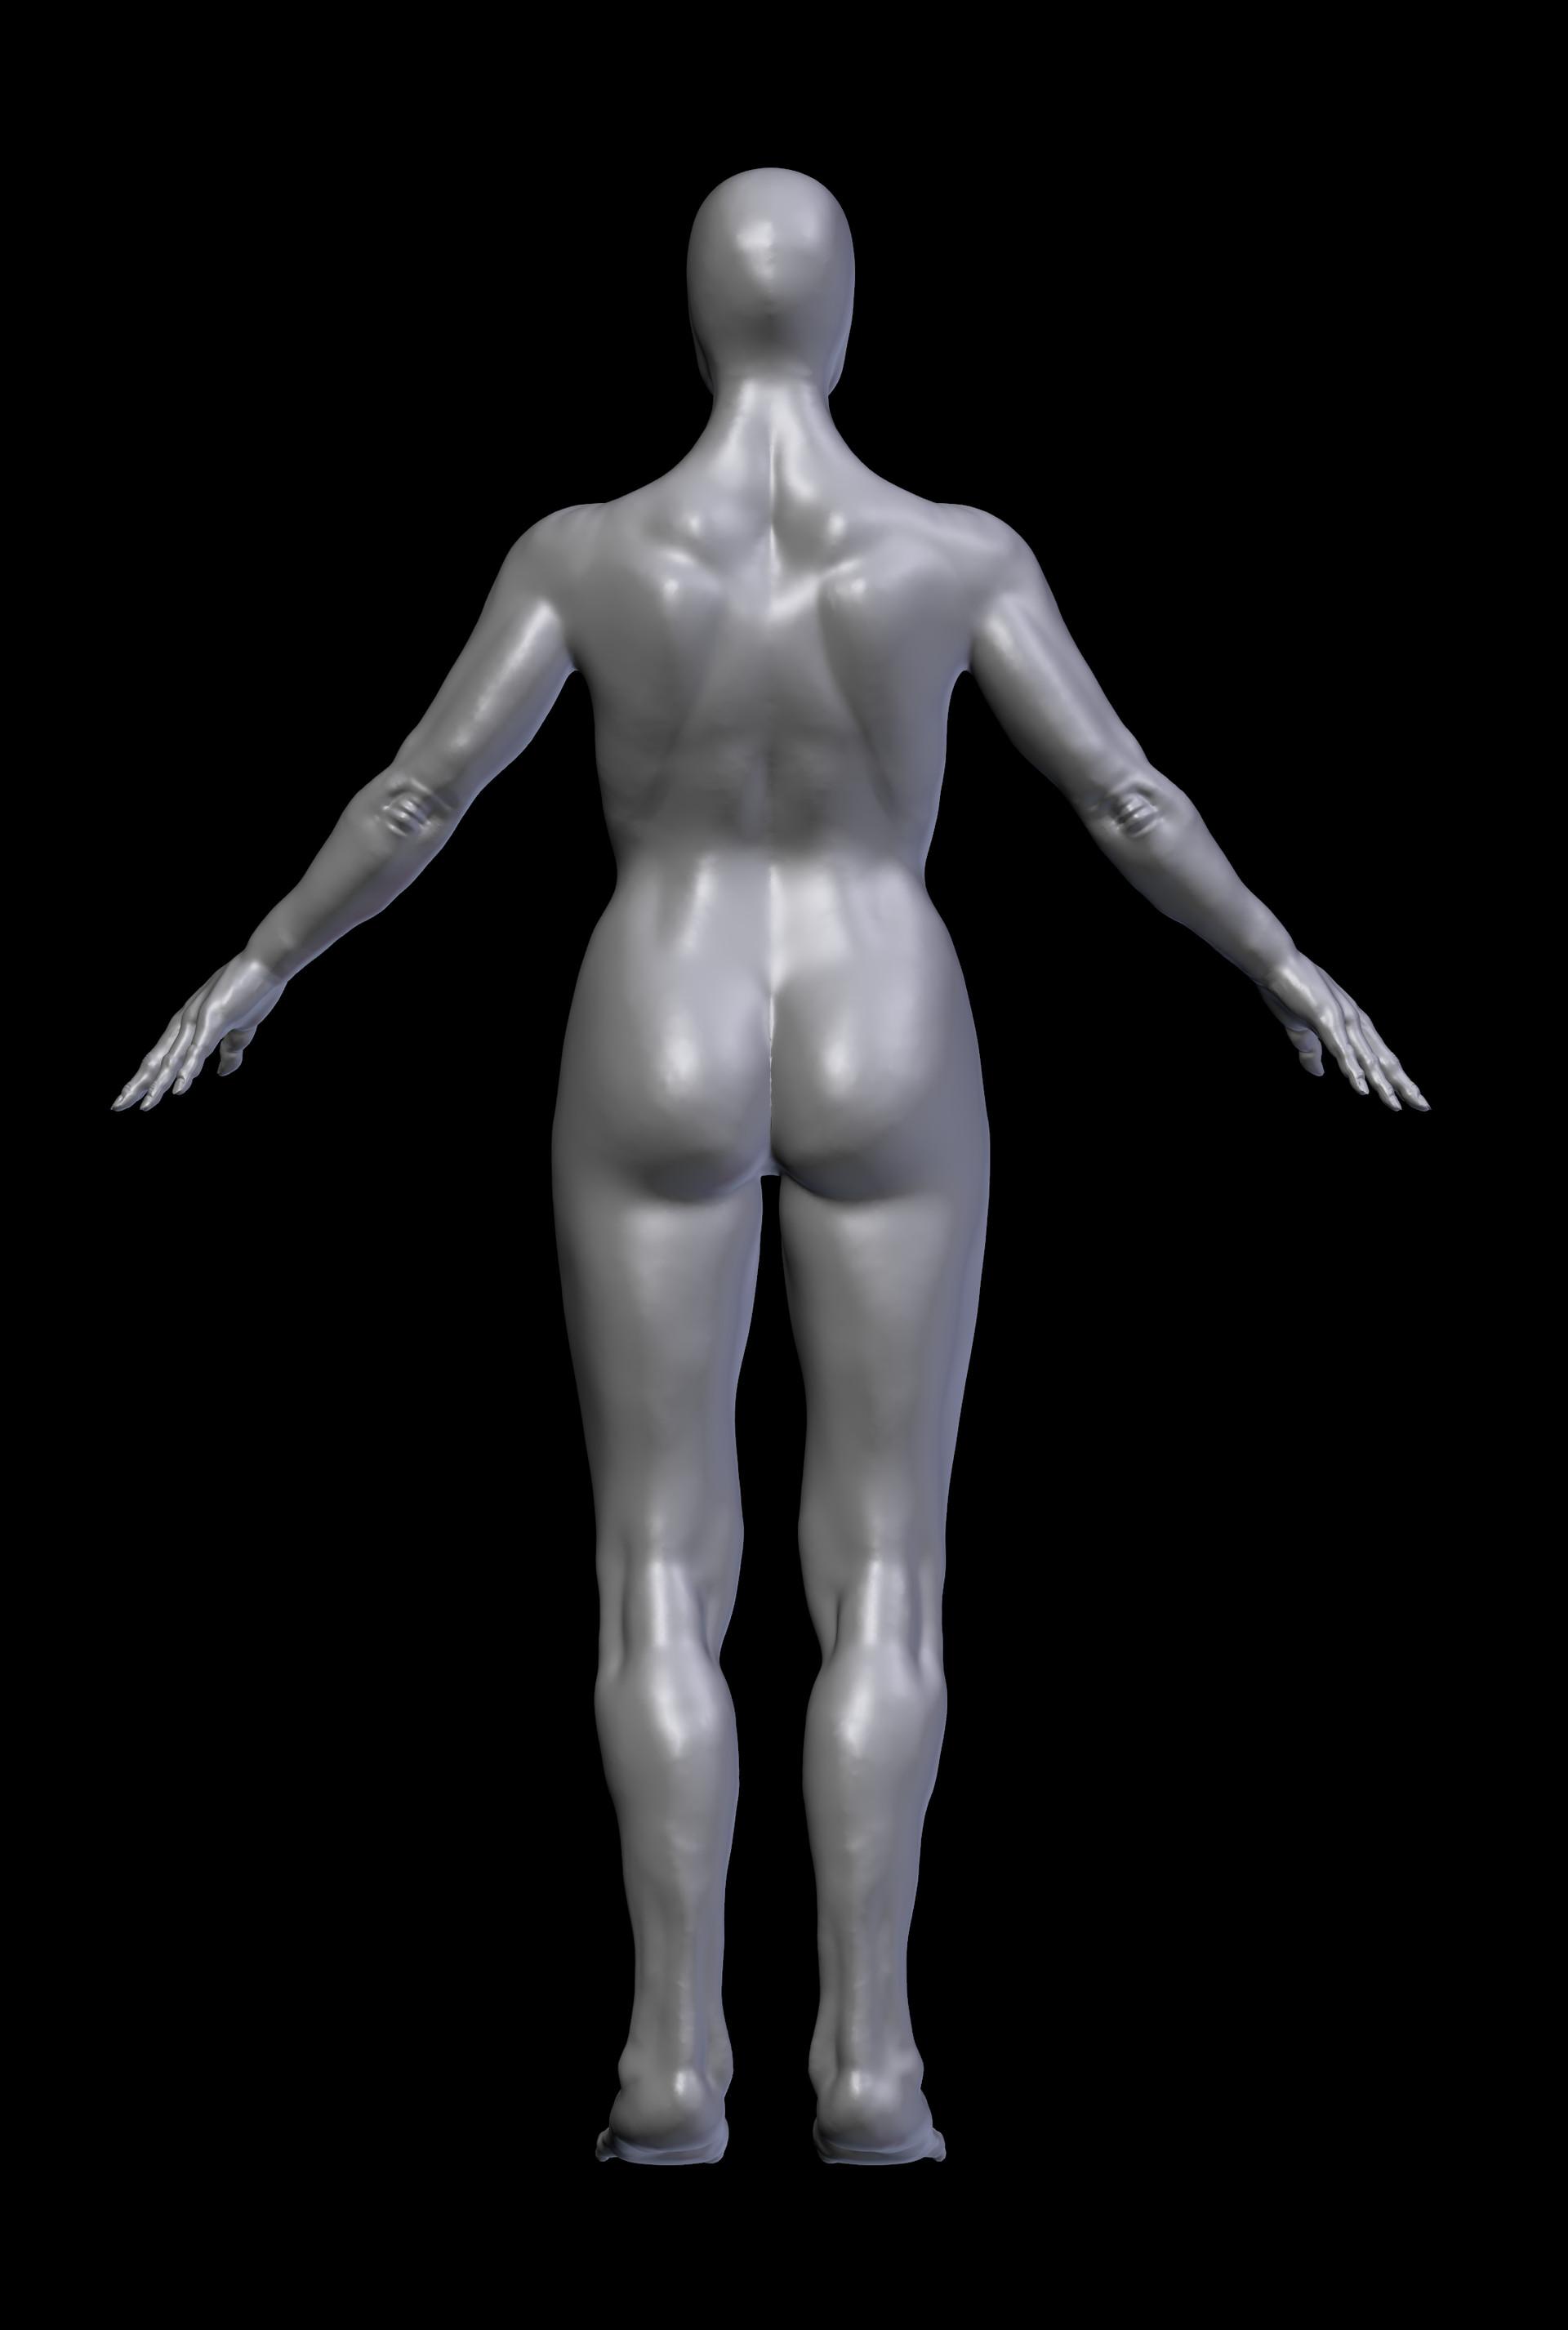 Master Flaccid - Female Anatomy Practice